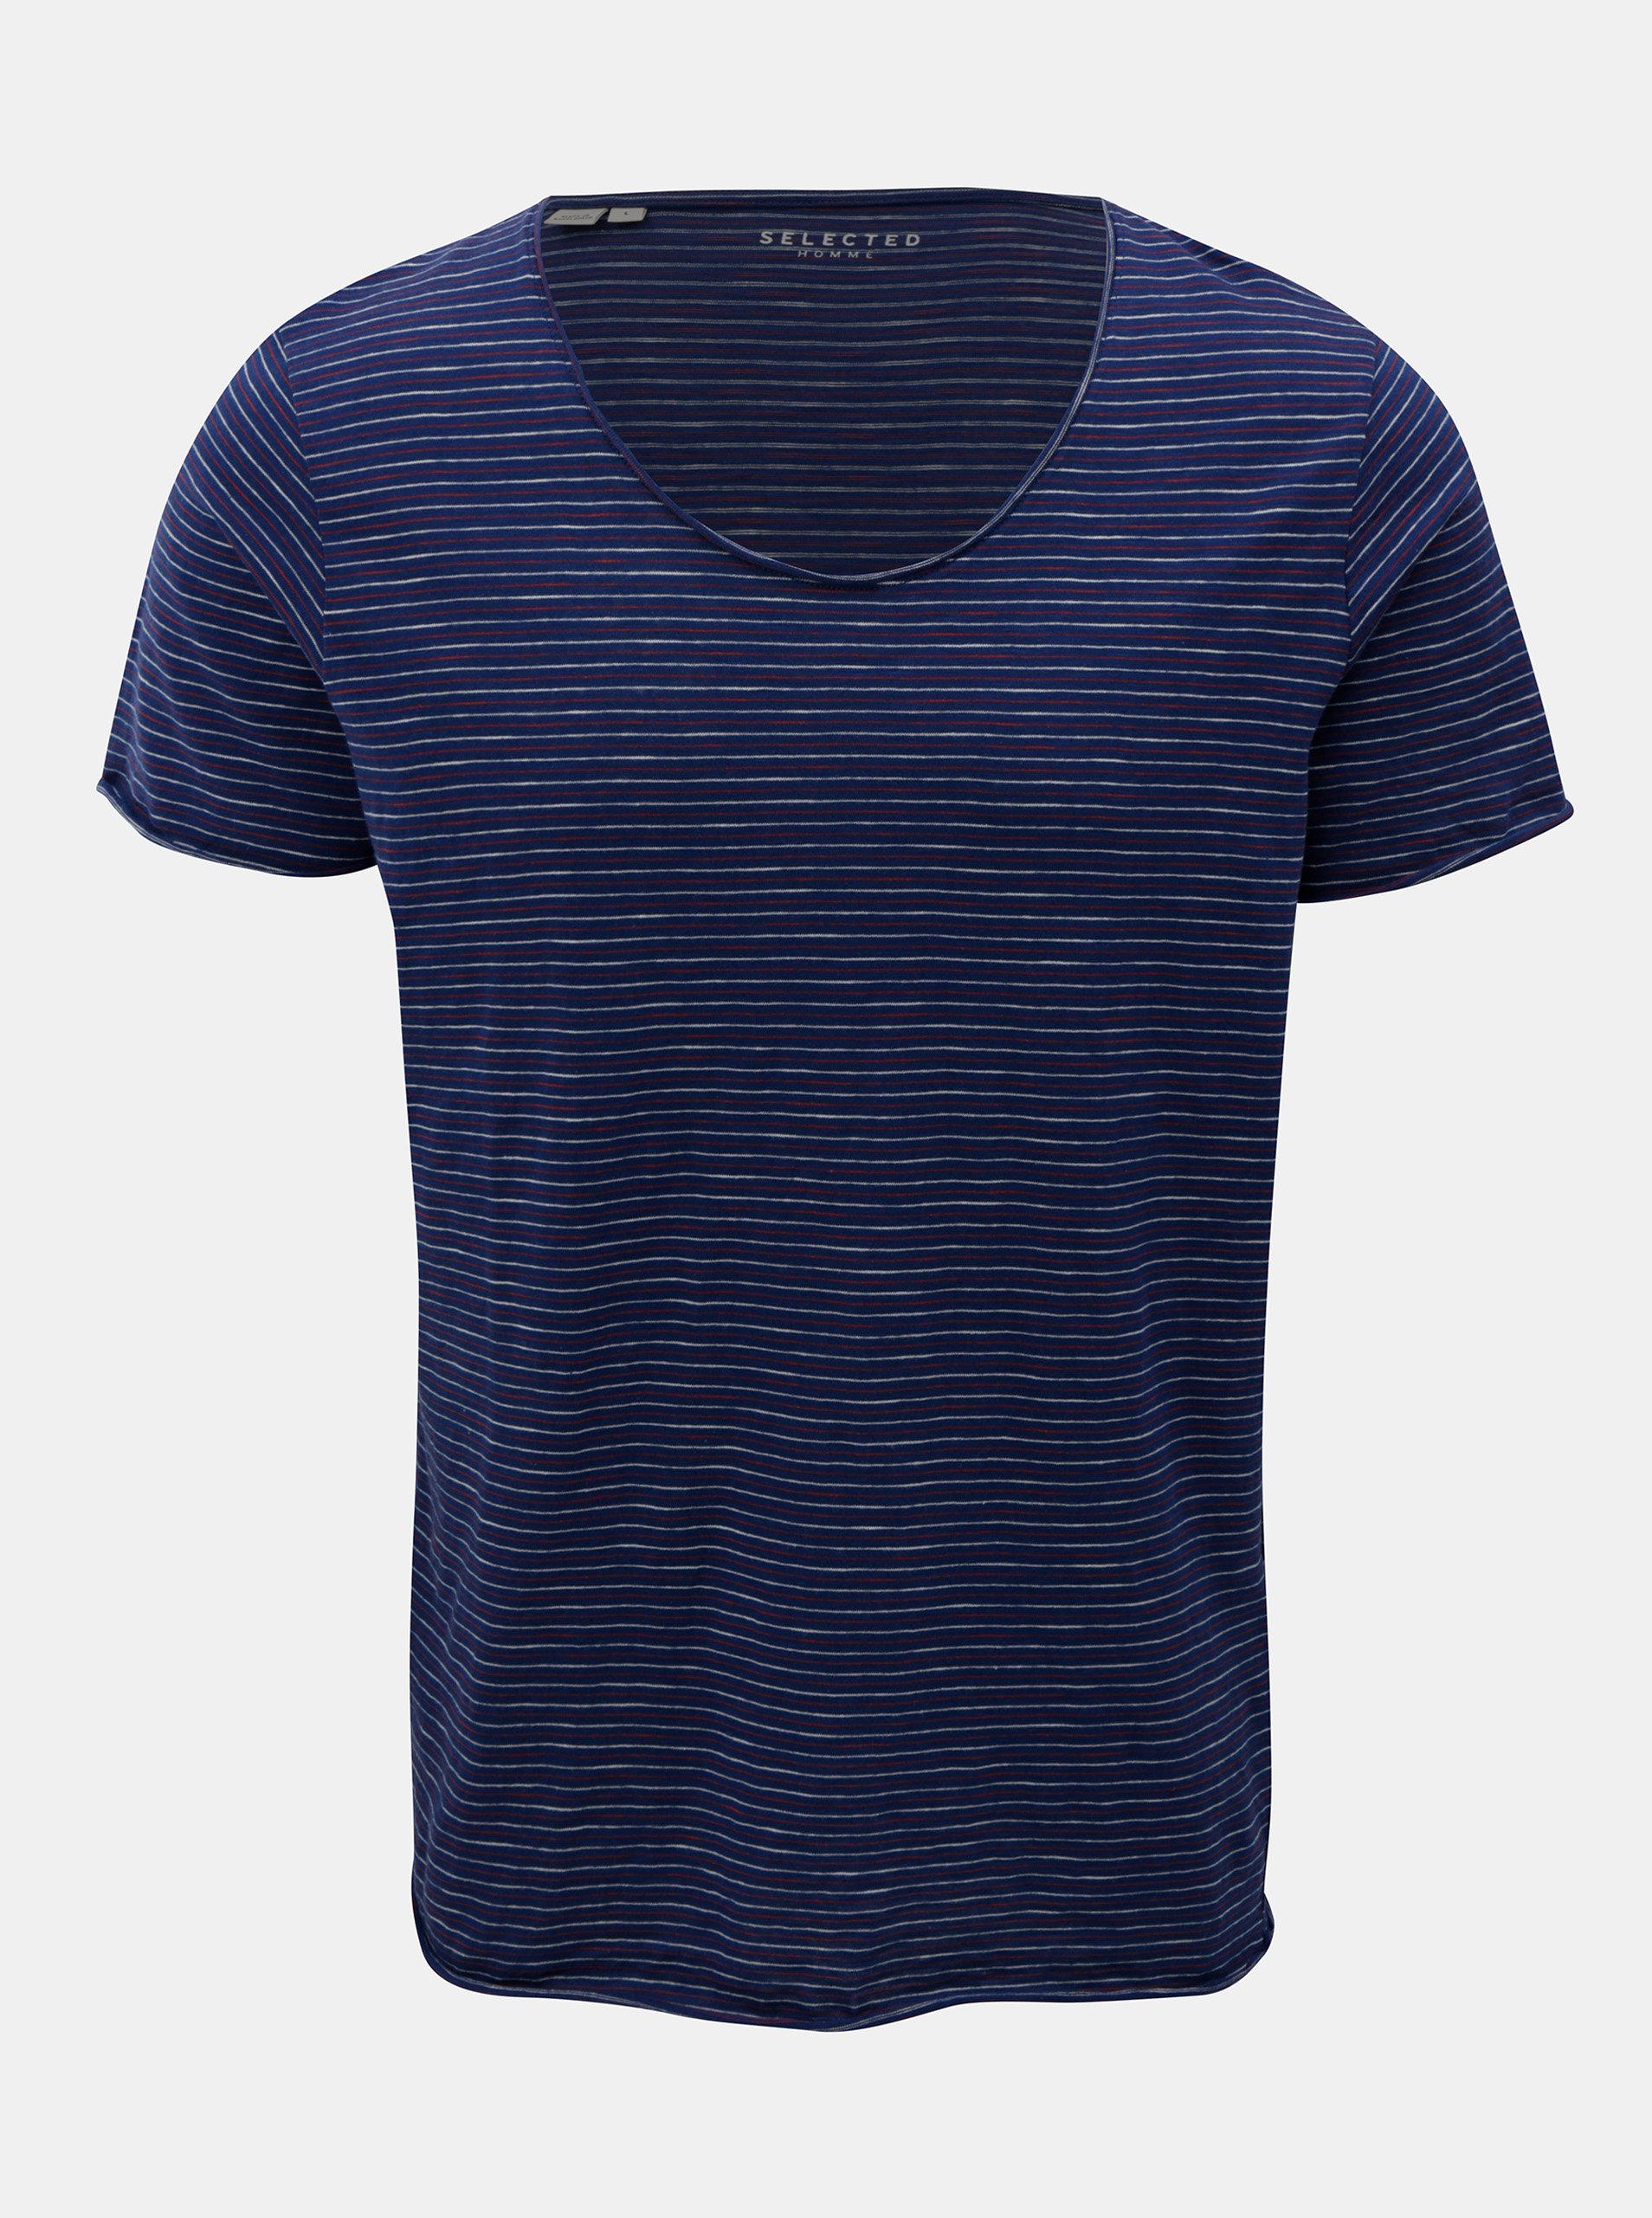 74636b347cea Tmavě modré pruhované basic tričko Selected Homme Merce ...